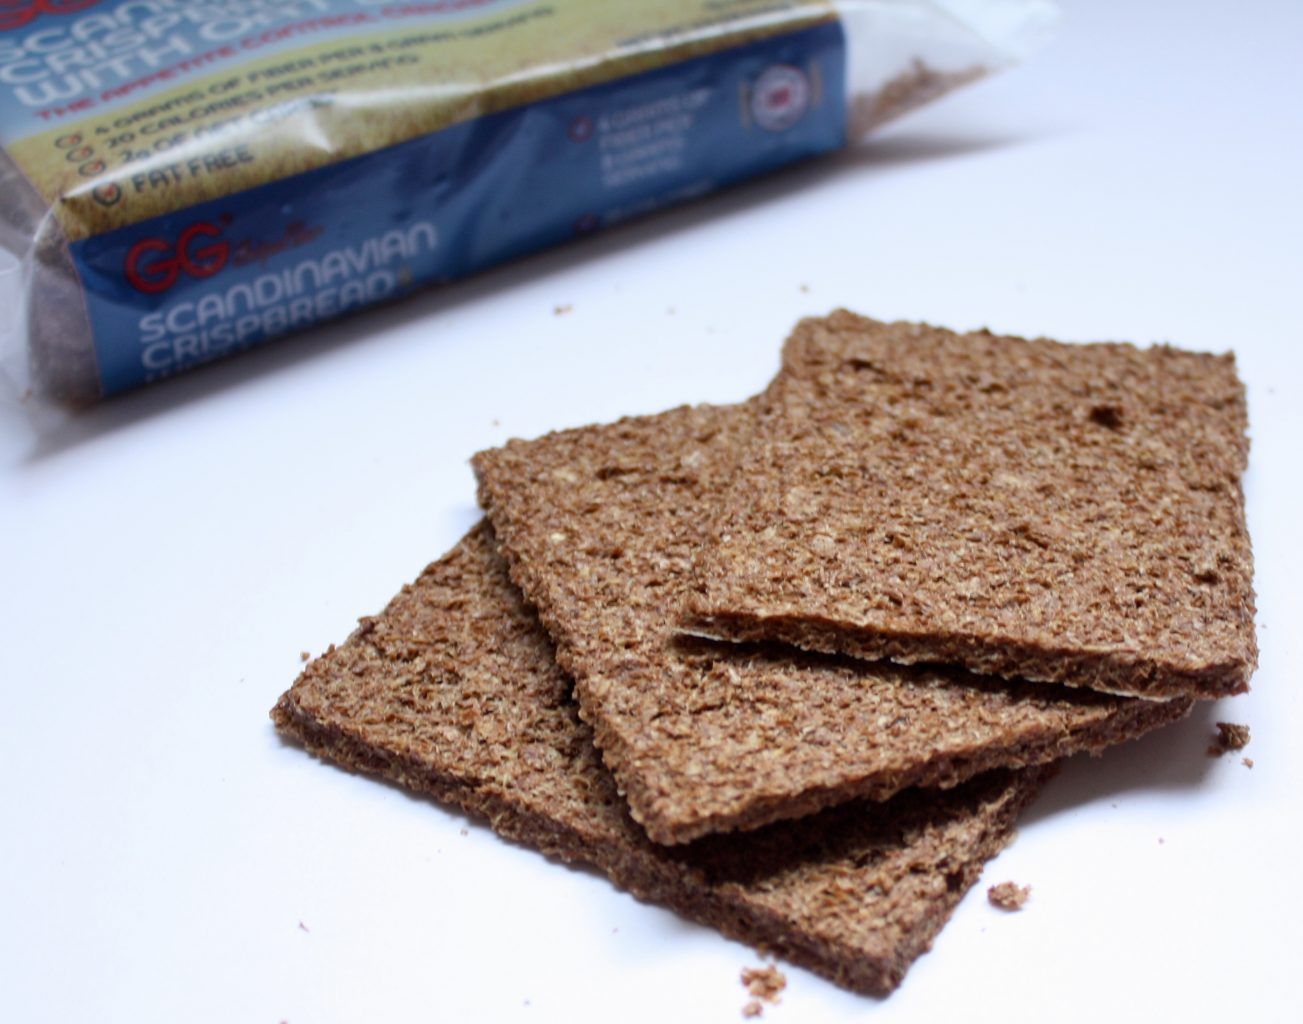 GG Crackers